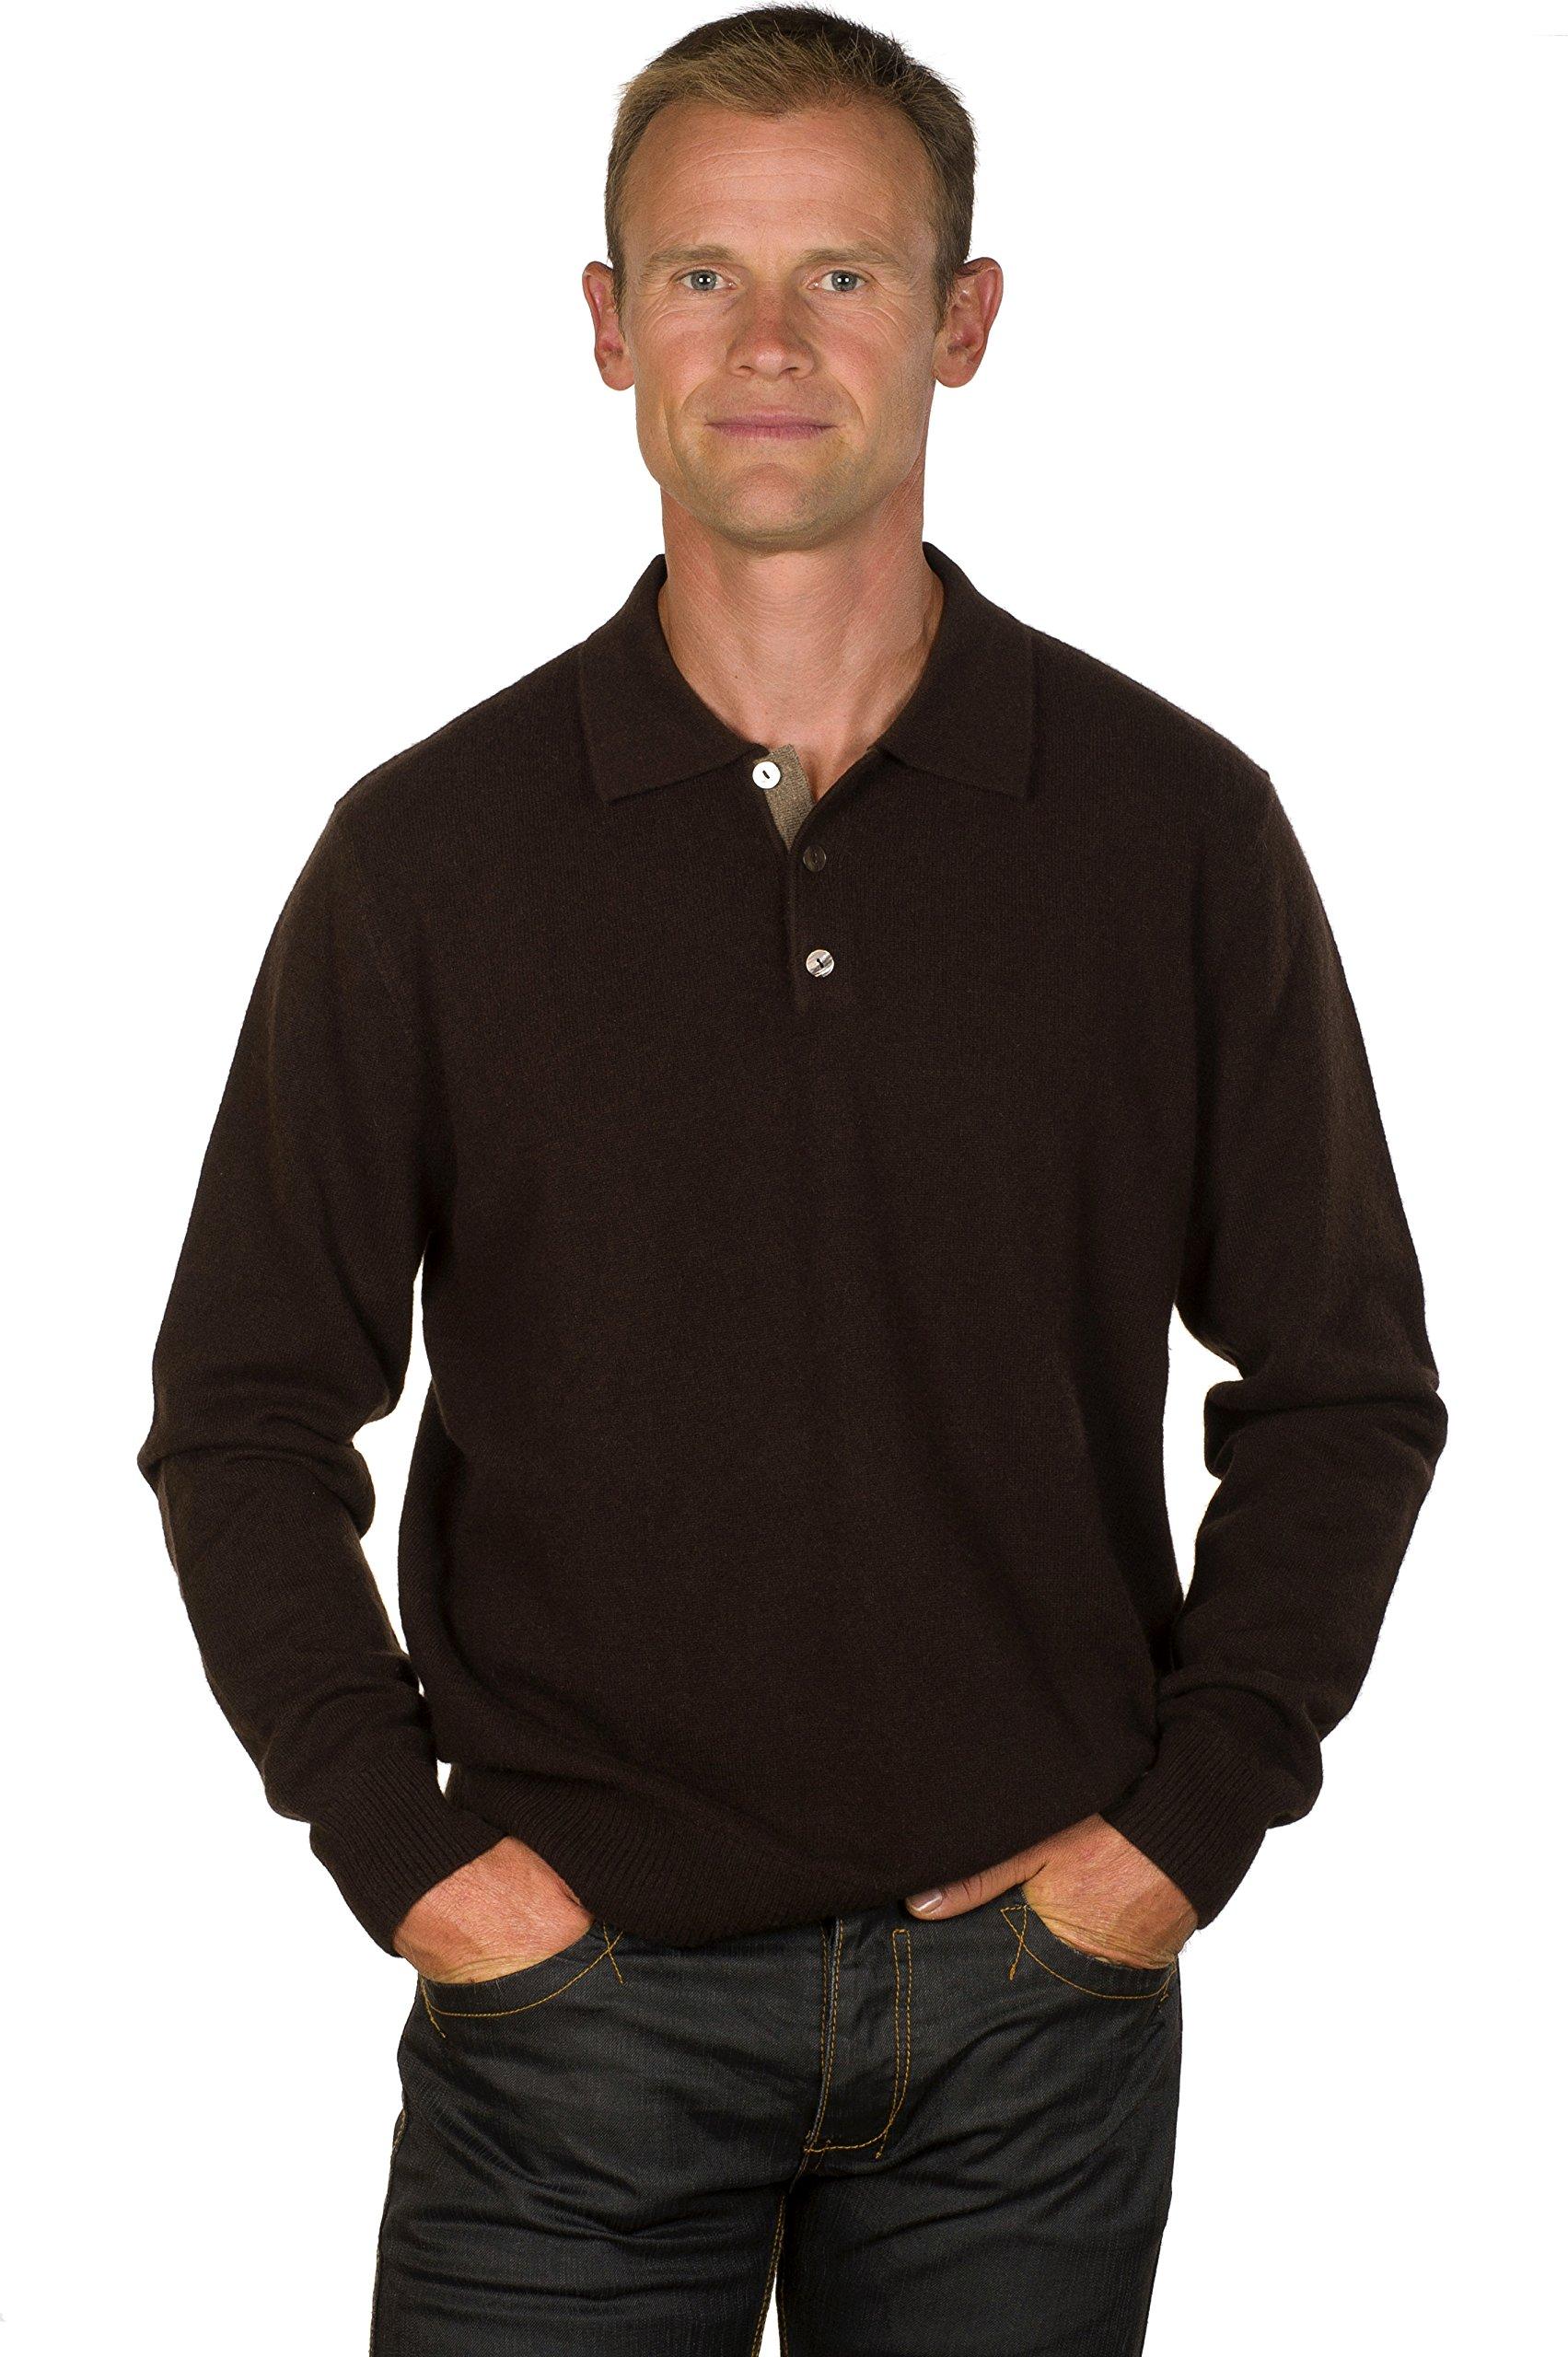 Ugholin Men's 100% Cashmere Polo Style Sweater XXL Dark Brown